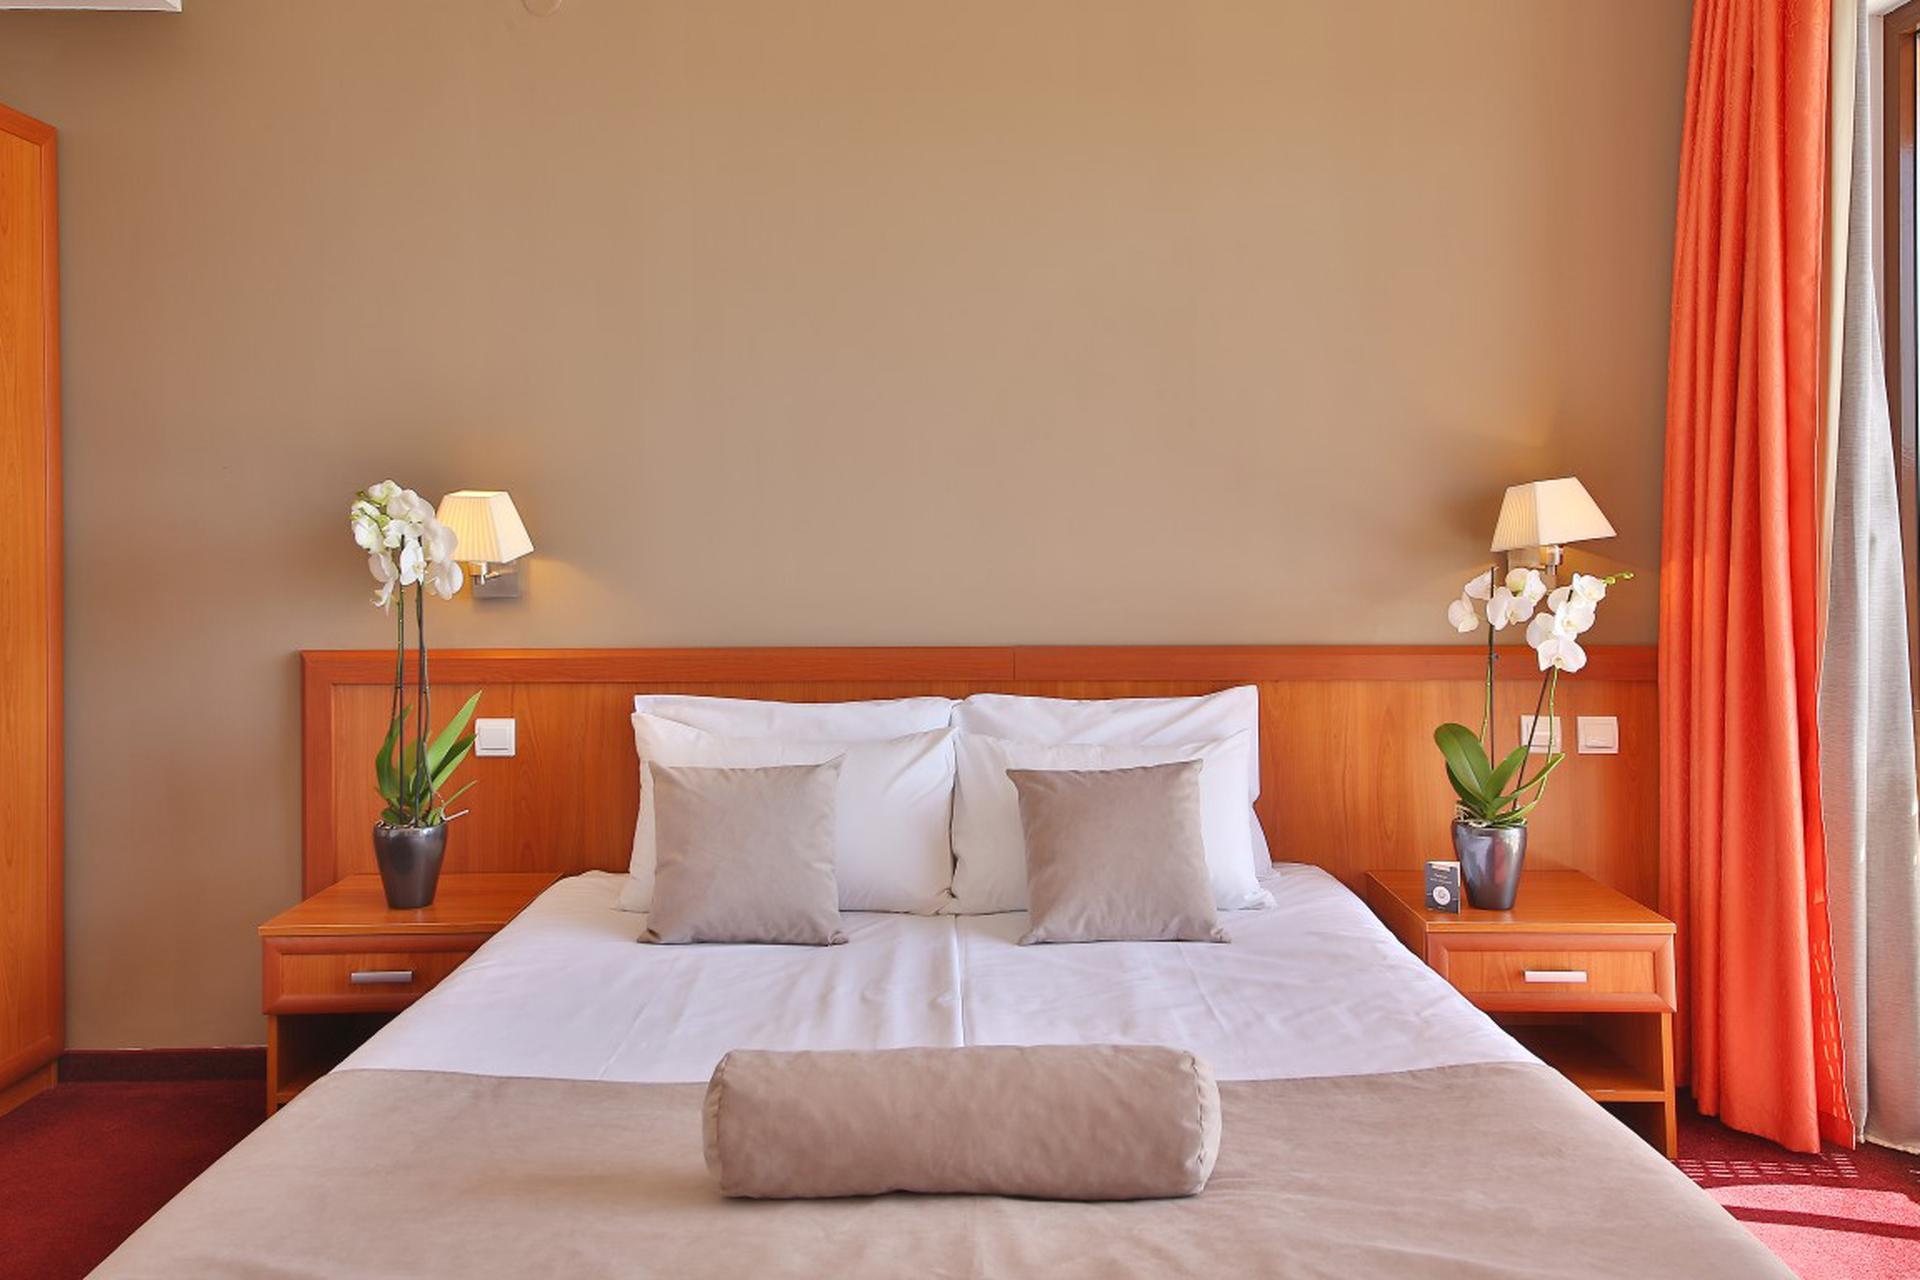 هتل پرستیژ آکواپارک وارنا